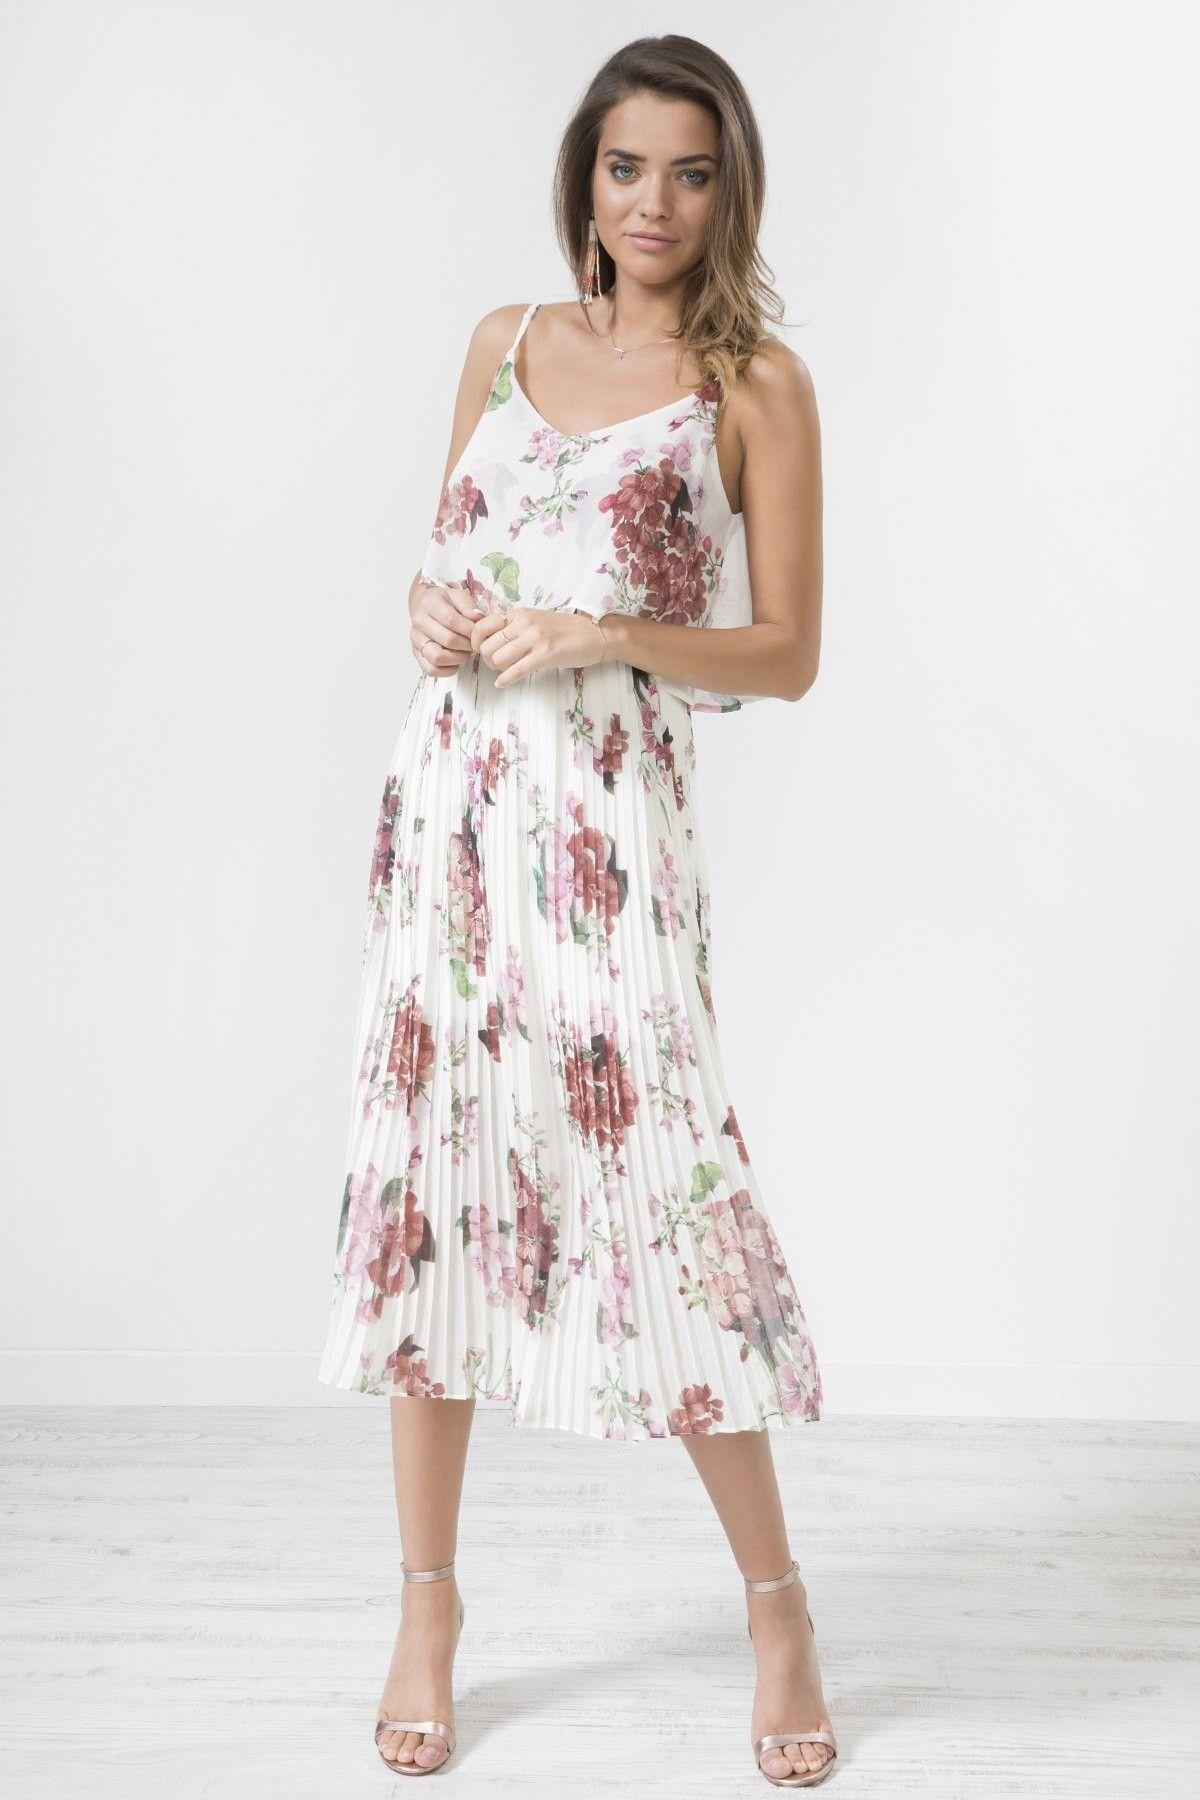 Park Art My WordPress Blog_White Summer Dress With Red Flowers